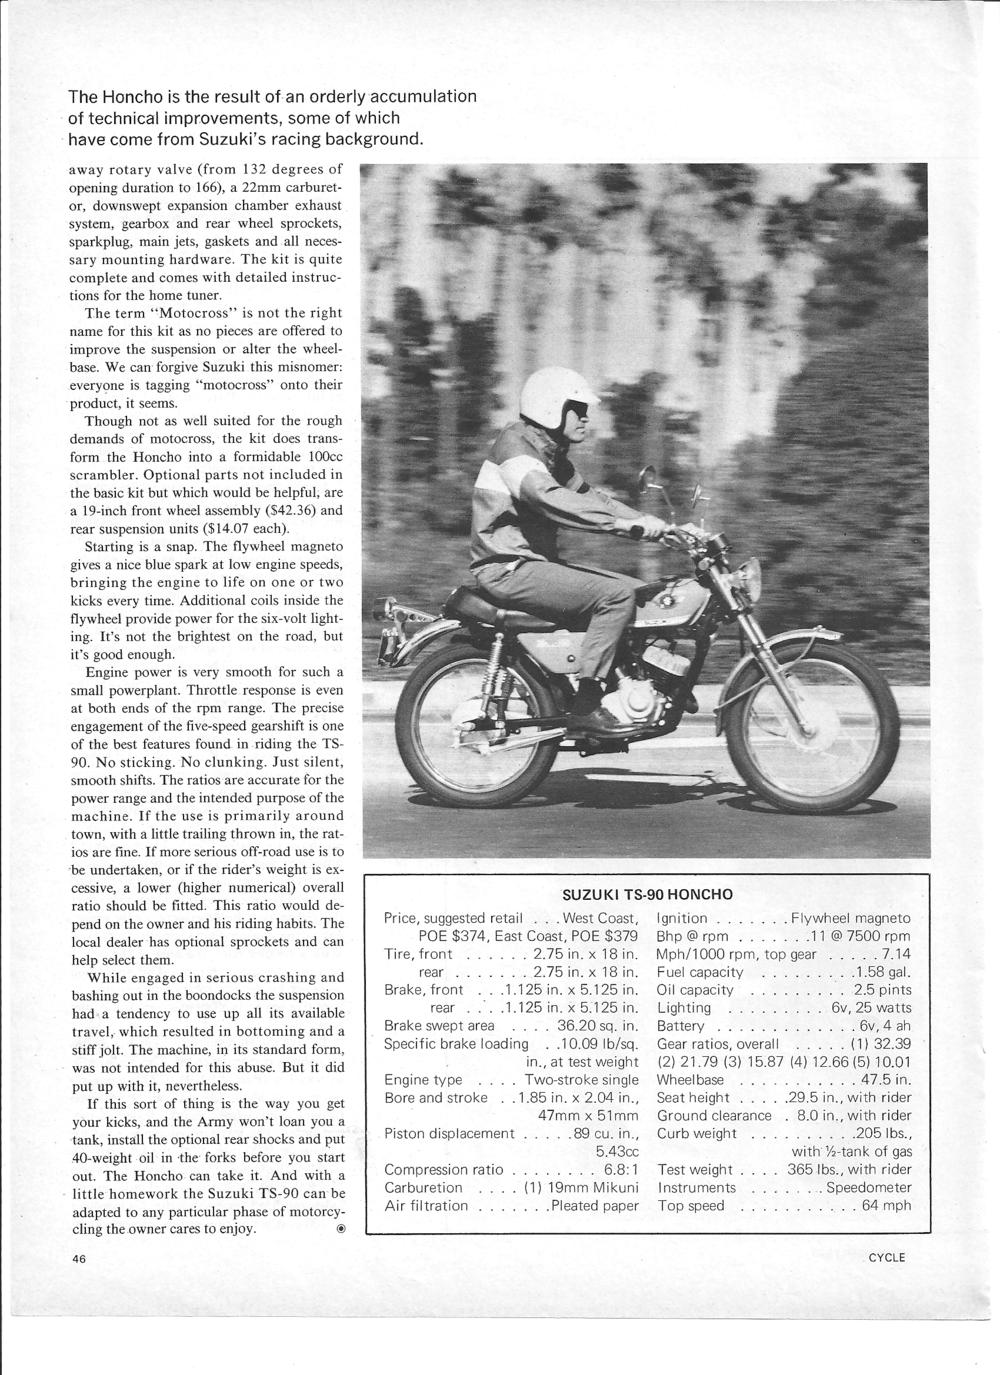 1971_Suzuki_TS-90_Honcho_test_pg4.png